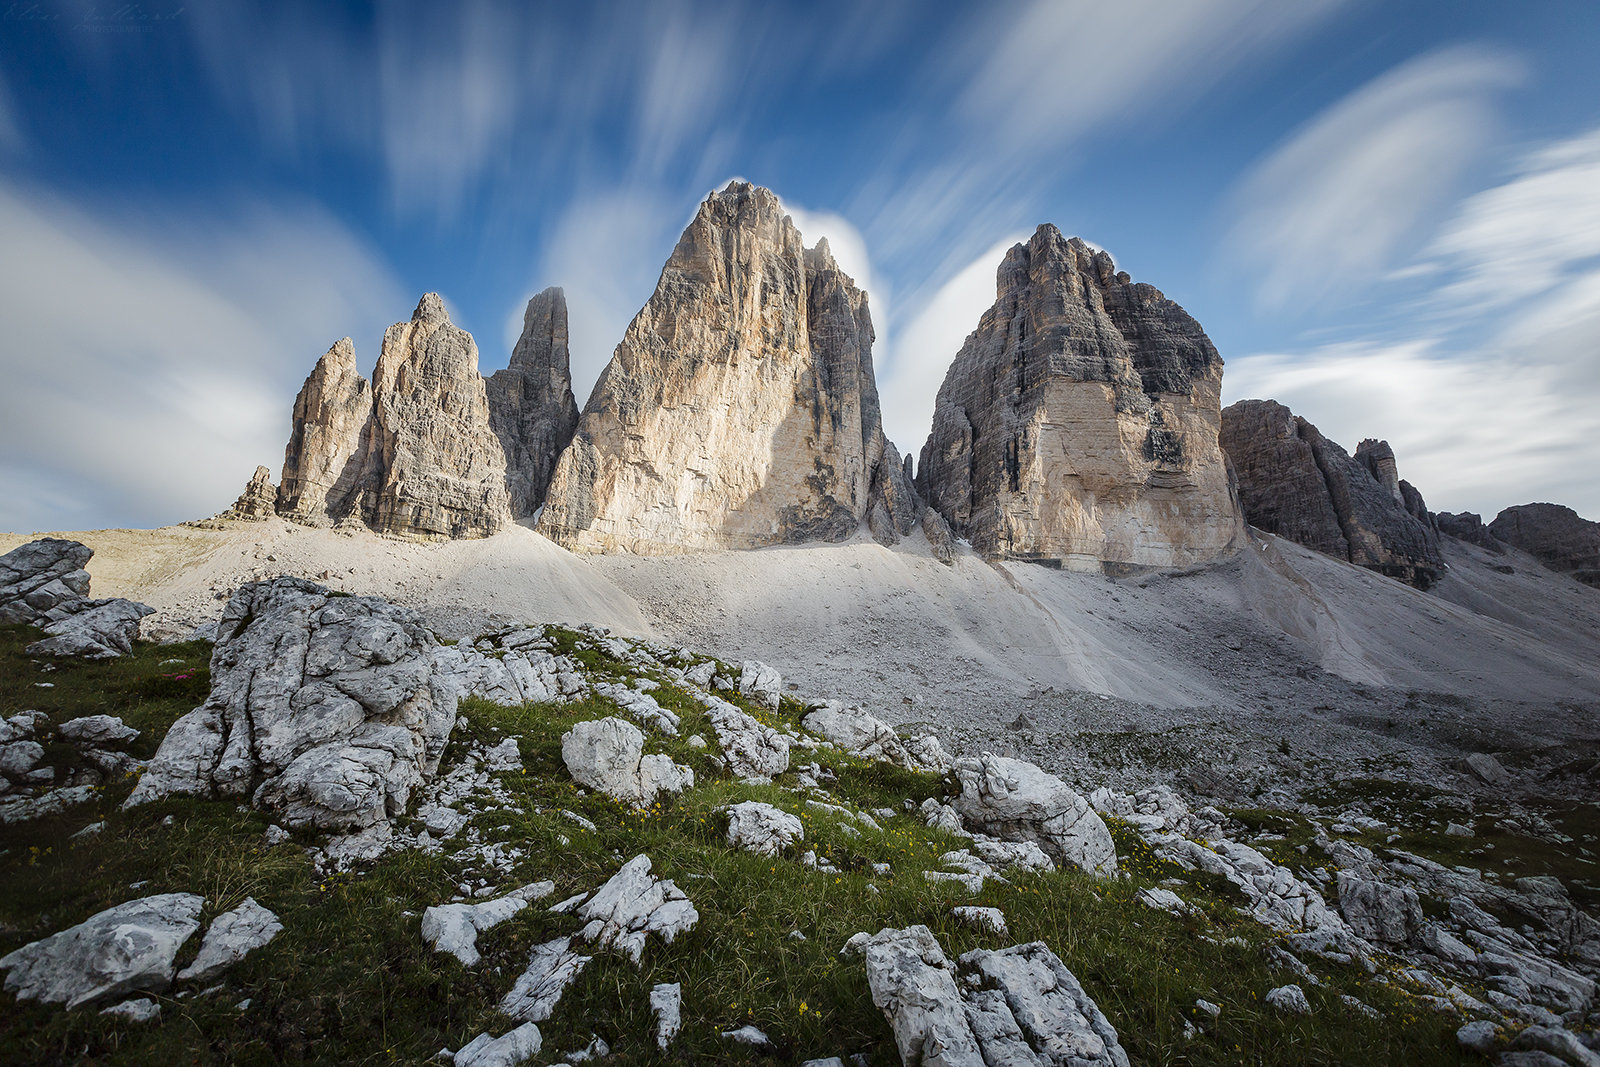 elise-julliard-photographe-lyon-france-montagne-dolomites-dolomiti-italie-paysage-tre-cime-di-lavaredo